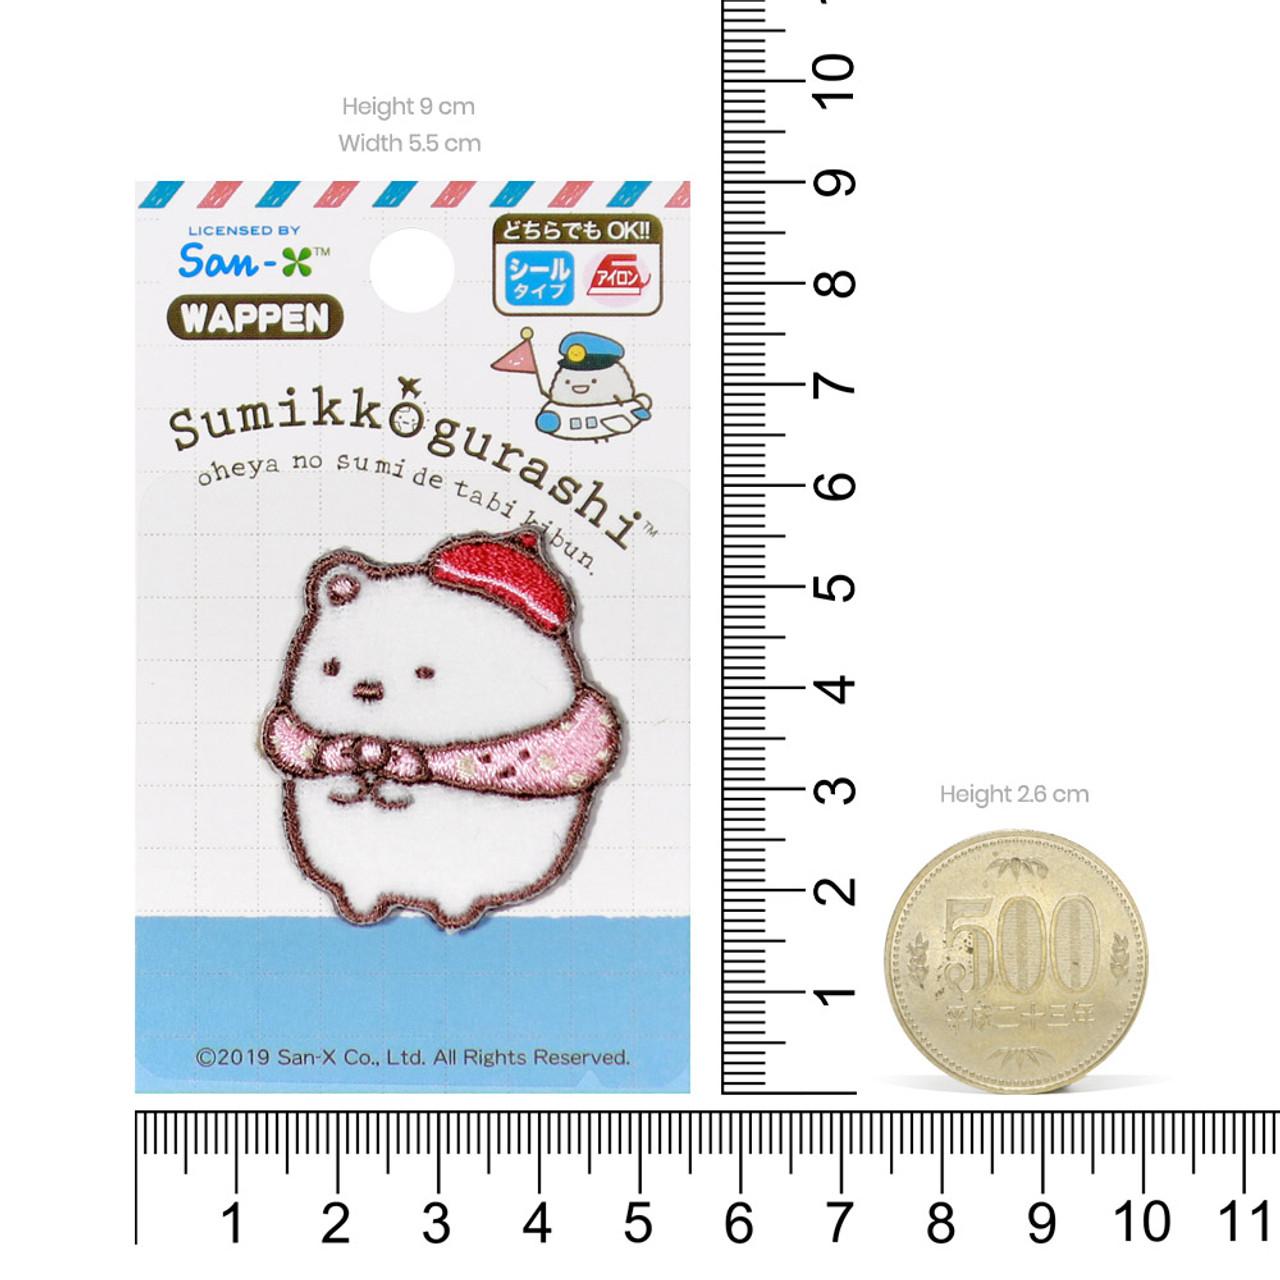 Sumikko Gurashi Iron On Patch Travel Polar Bear PSU106 ( Proportion )